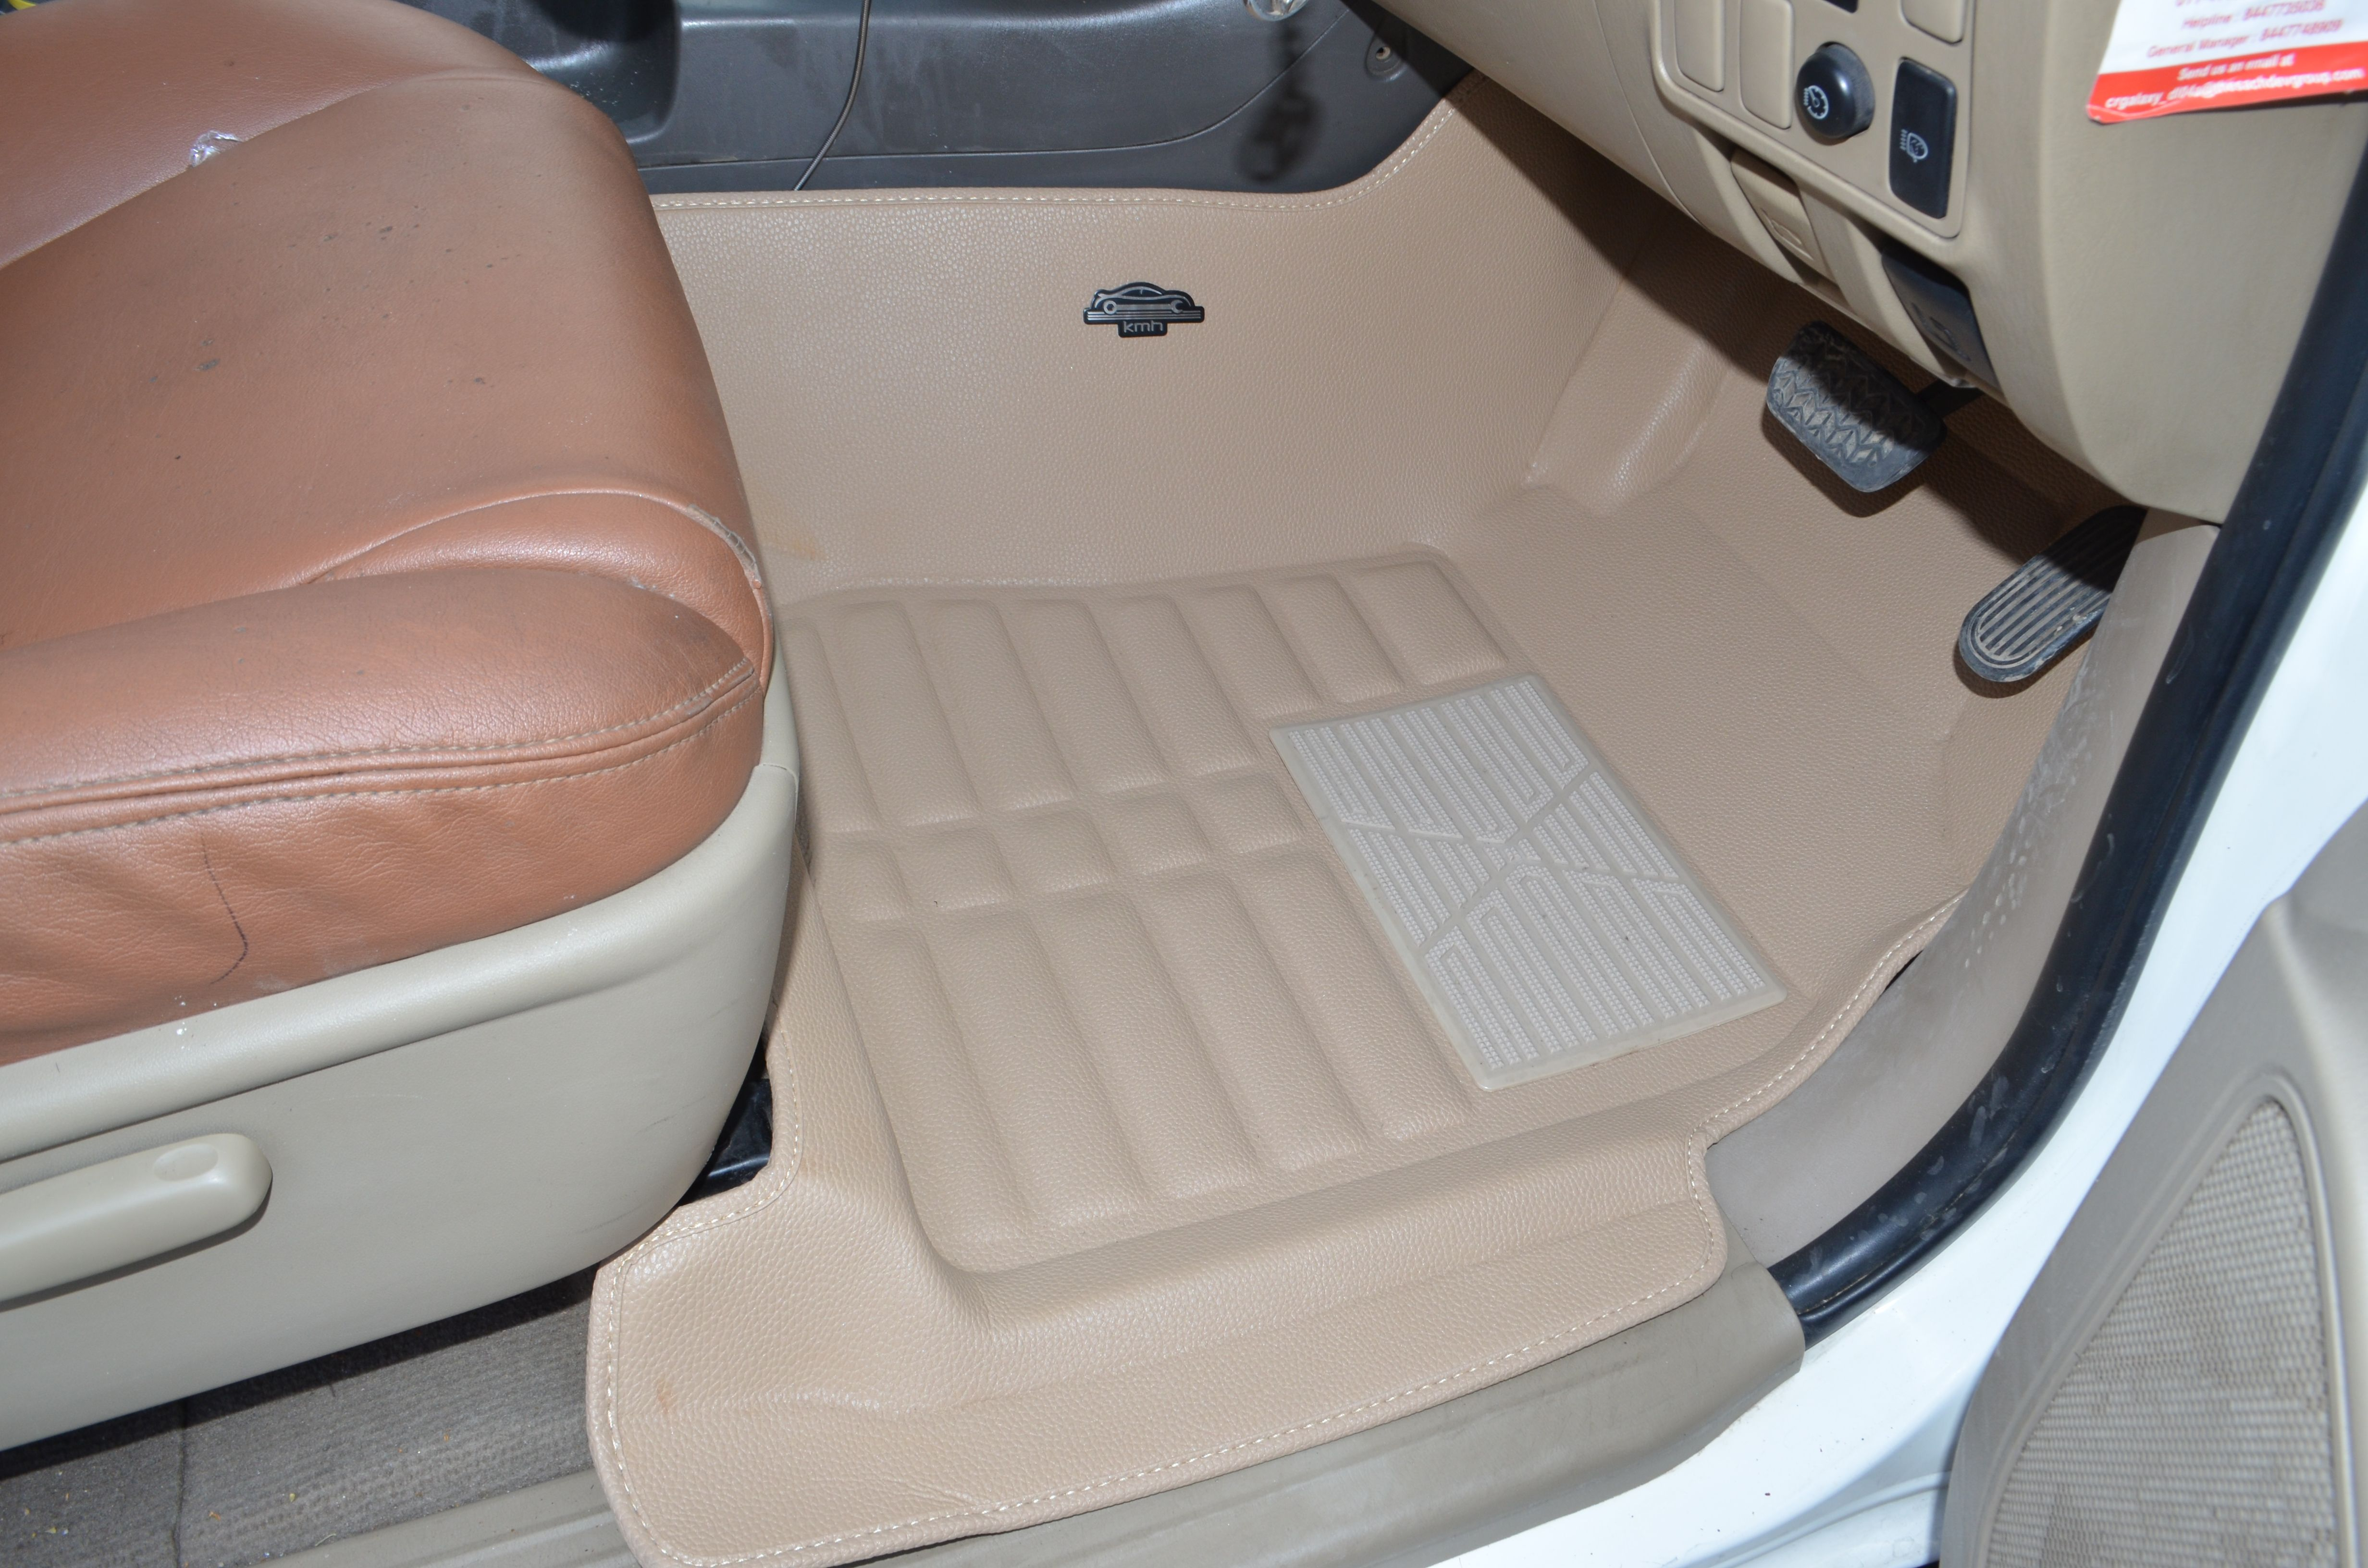 Kmh 5d Mats Fitted In Toyota Fortuner Beige Car Floor Mats